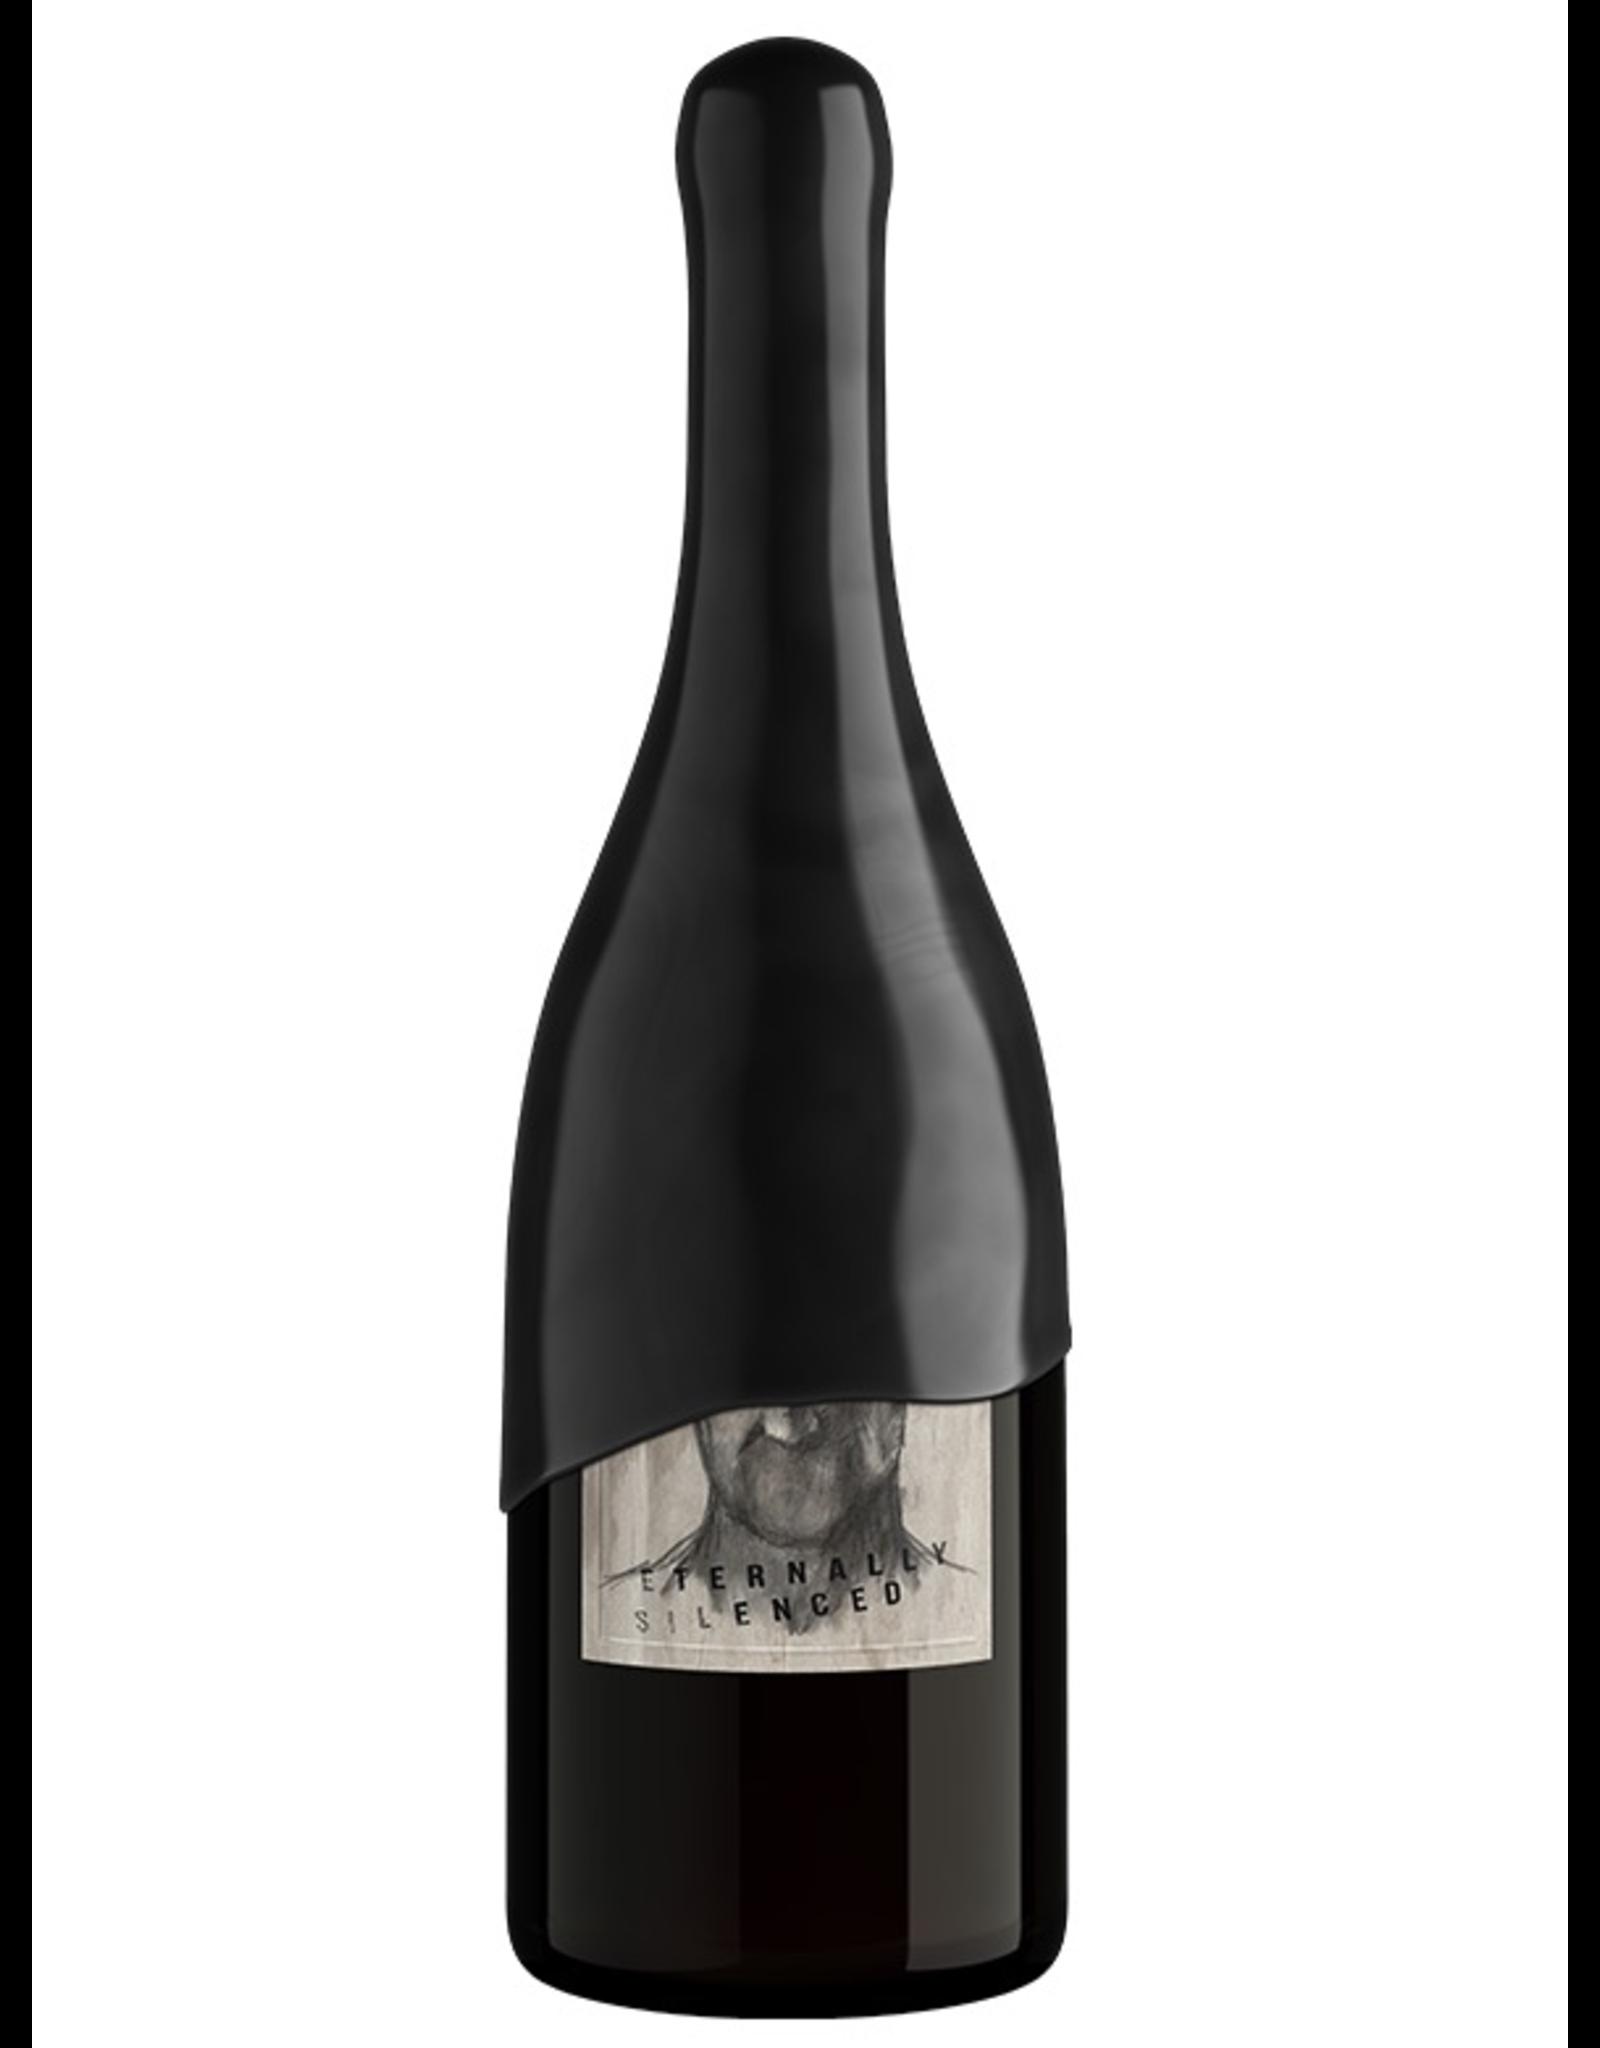 Red Wine 2018, Eternally Silenced by The Prisoner Wine Company, Pinot Noir, Multi AVA, California, USA, 14.5% Alc, CT na